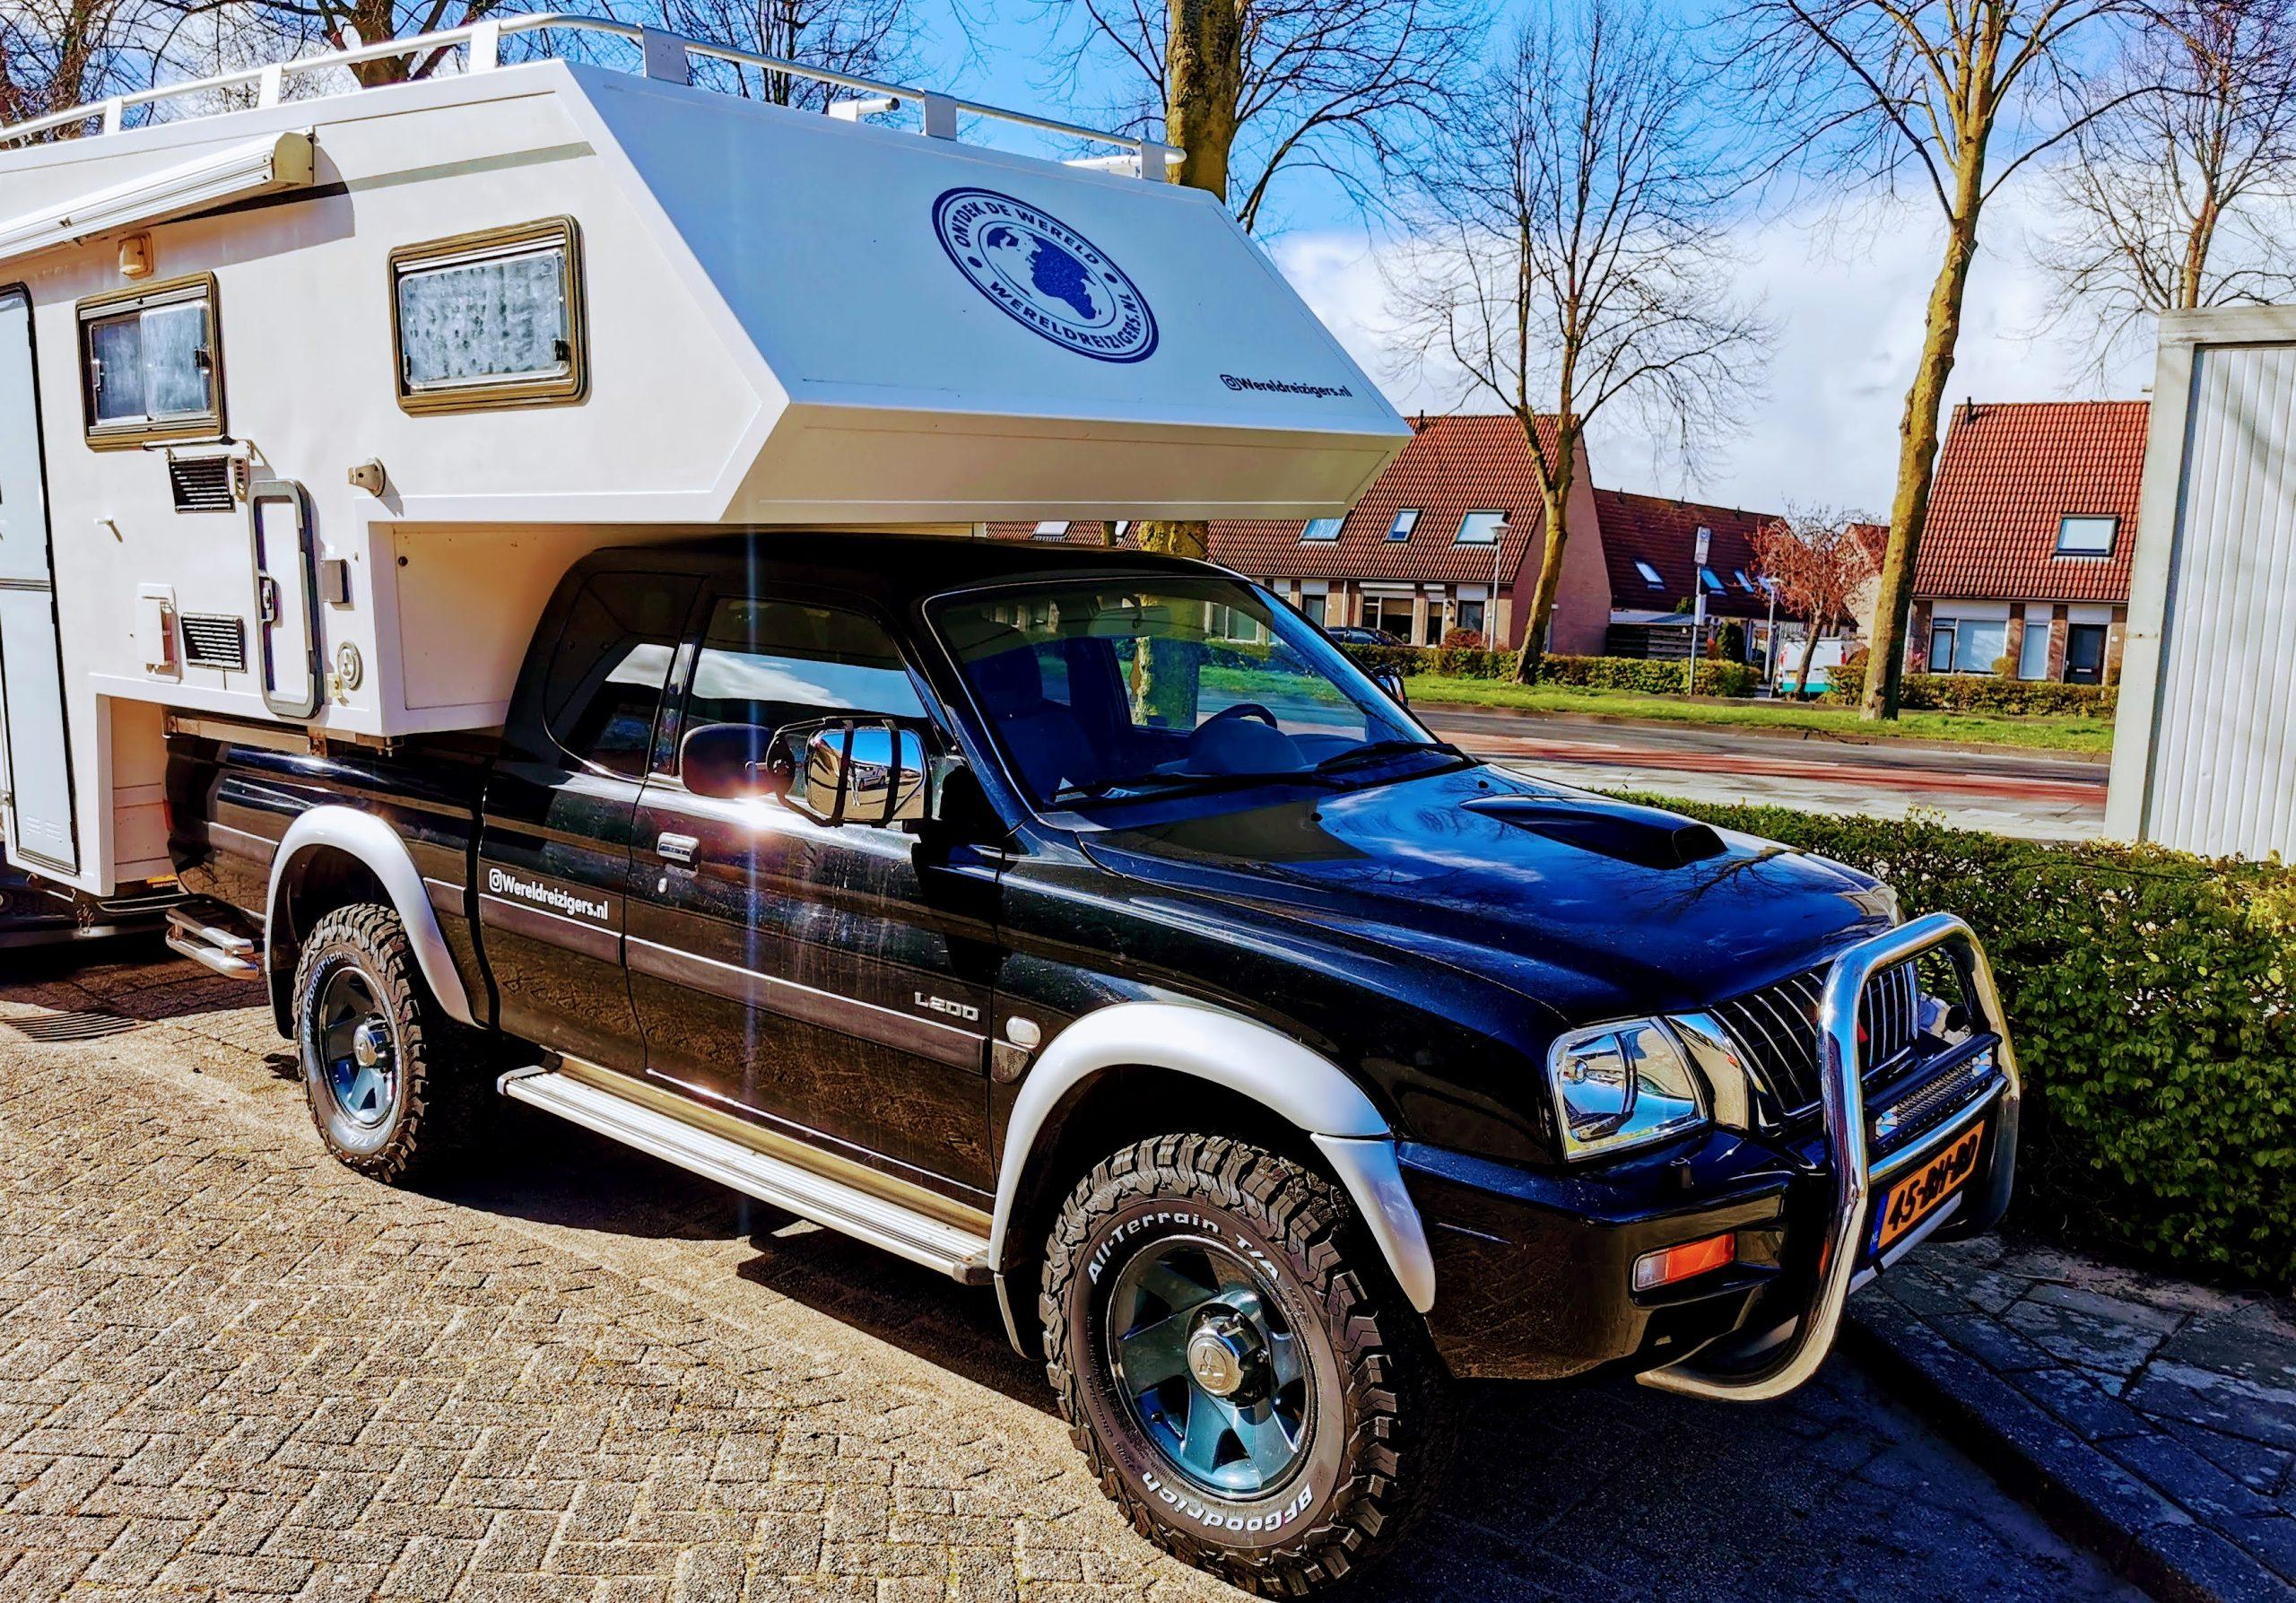 expeditie camper alarmsysteem gps tracker